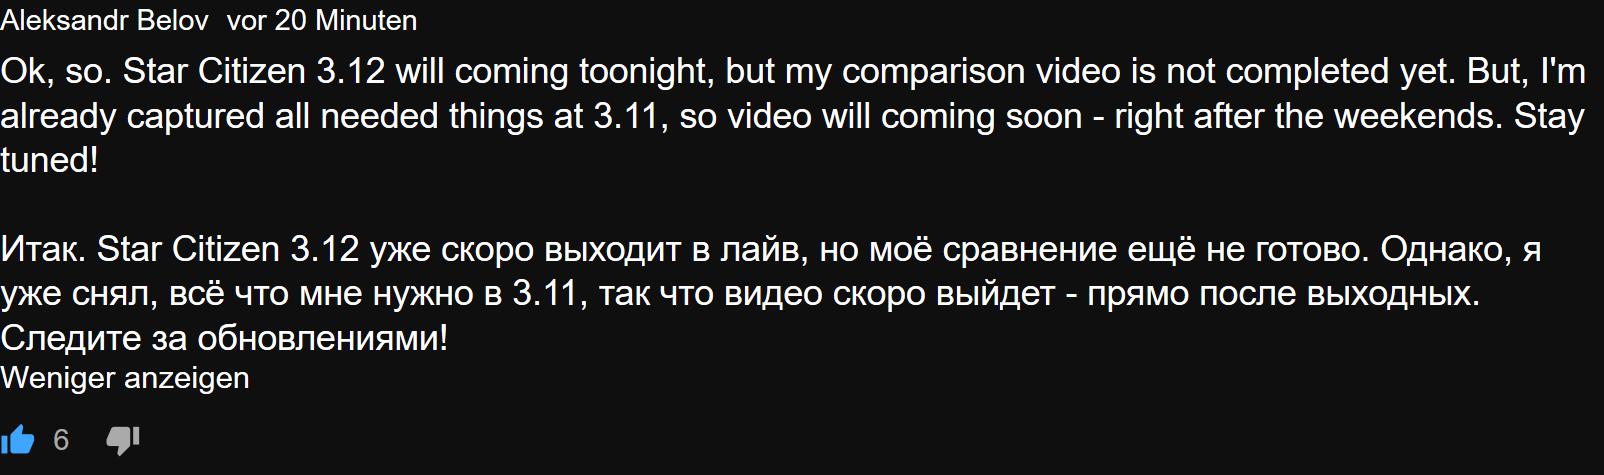 Screenshot_2020-12-17 Aleksandr Belov - YouTube.png